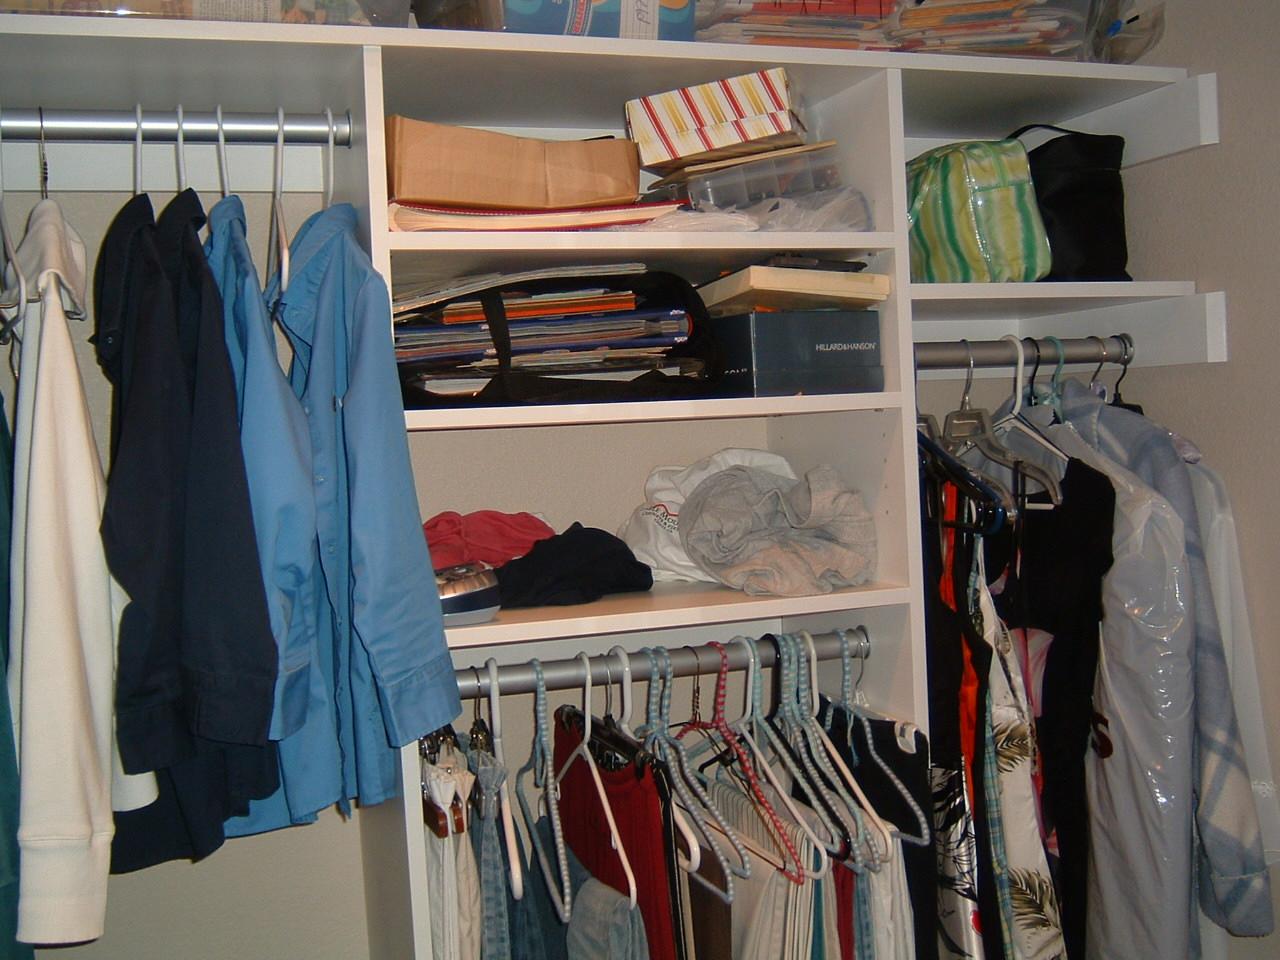 8-Nazaretta Closet .JPG